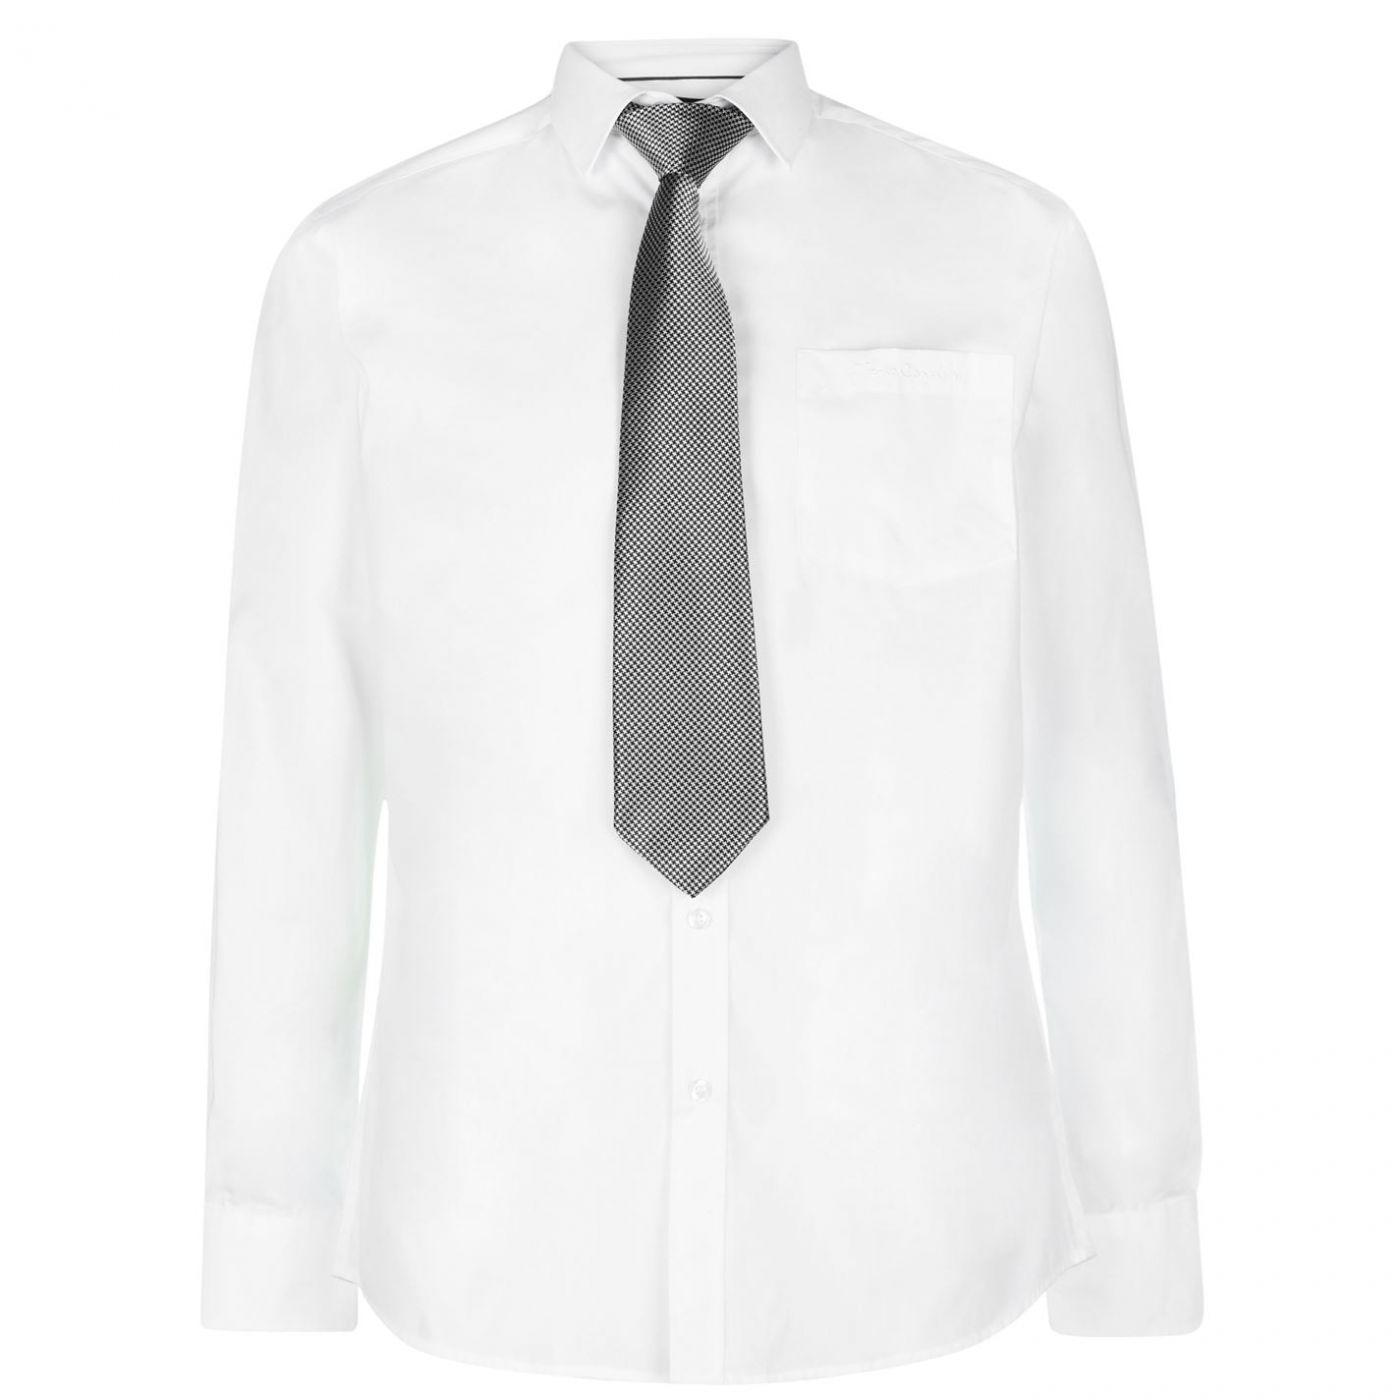 Men's shirt Pierre Cardin Shirt and Tie Set